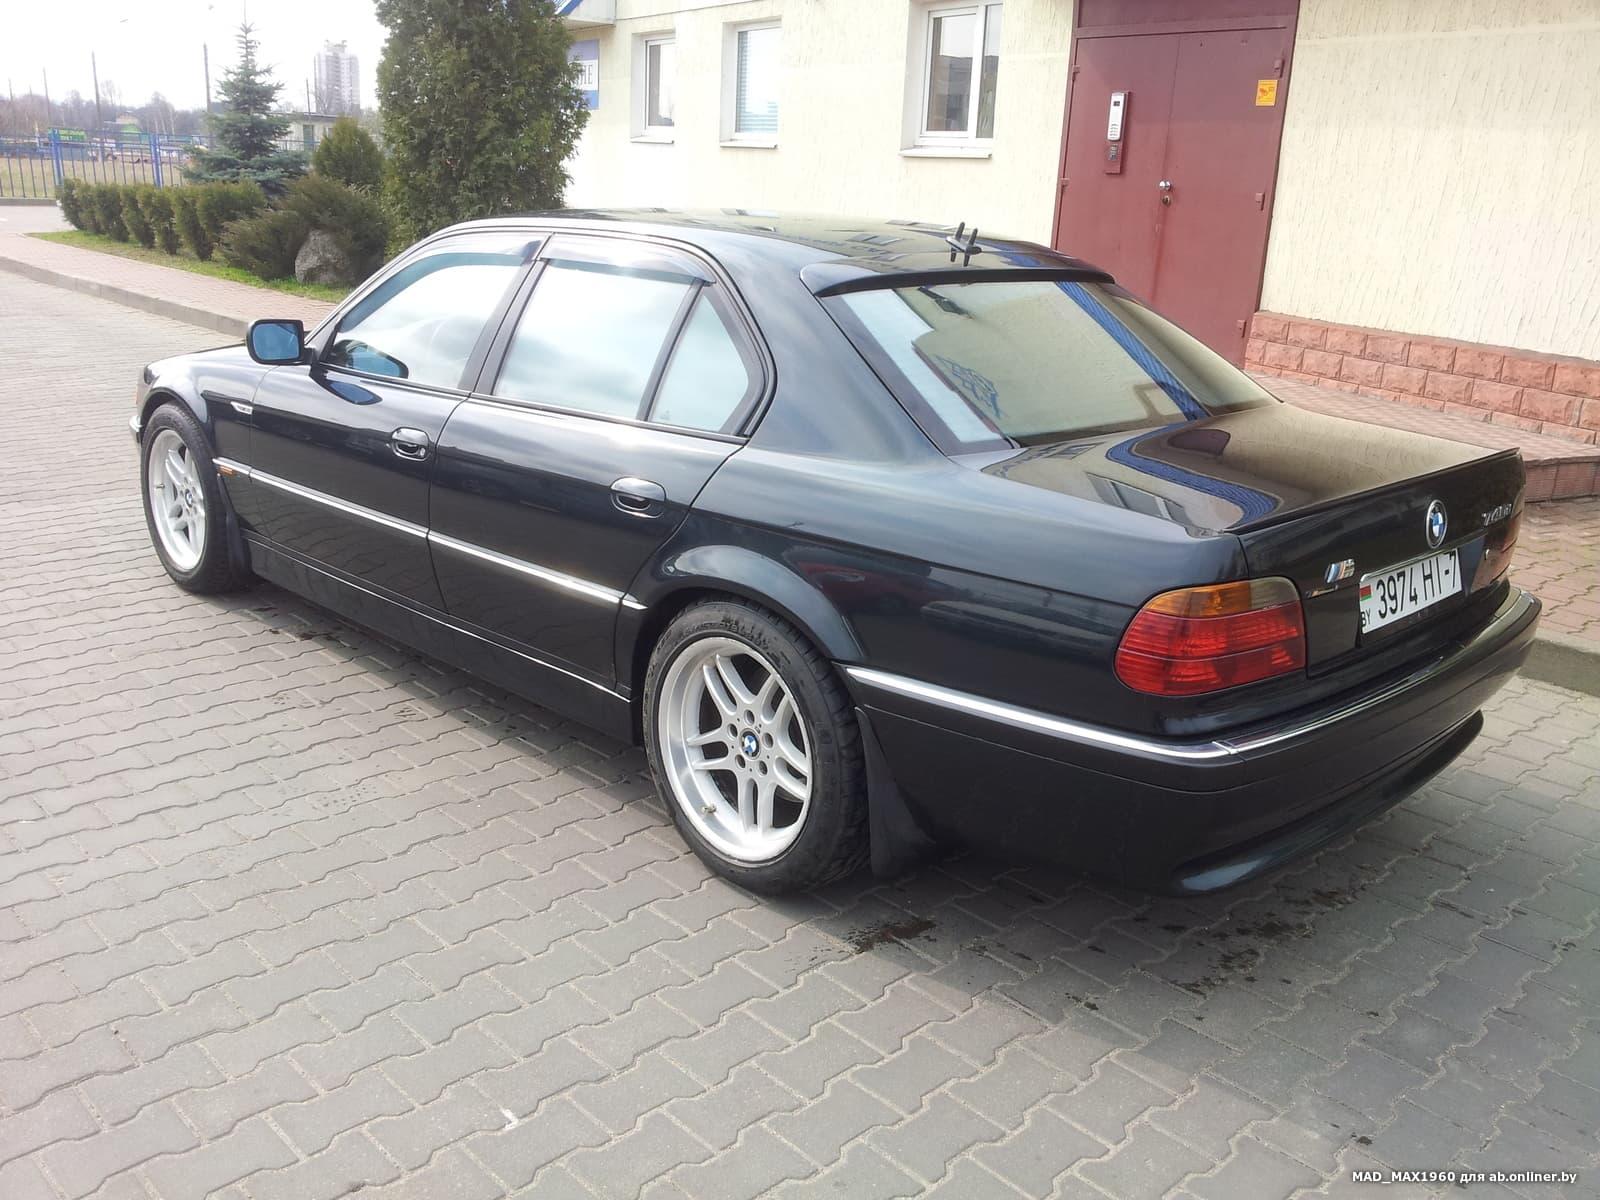 BMW 730 Snadowline Обмен Е65 Х5